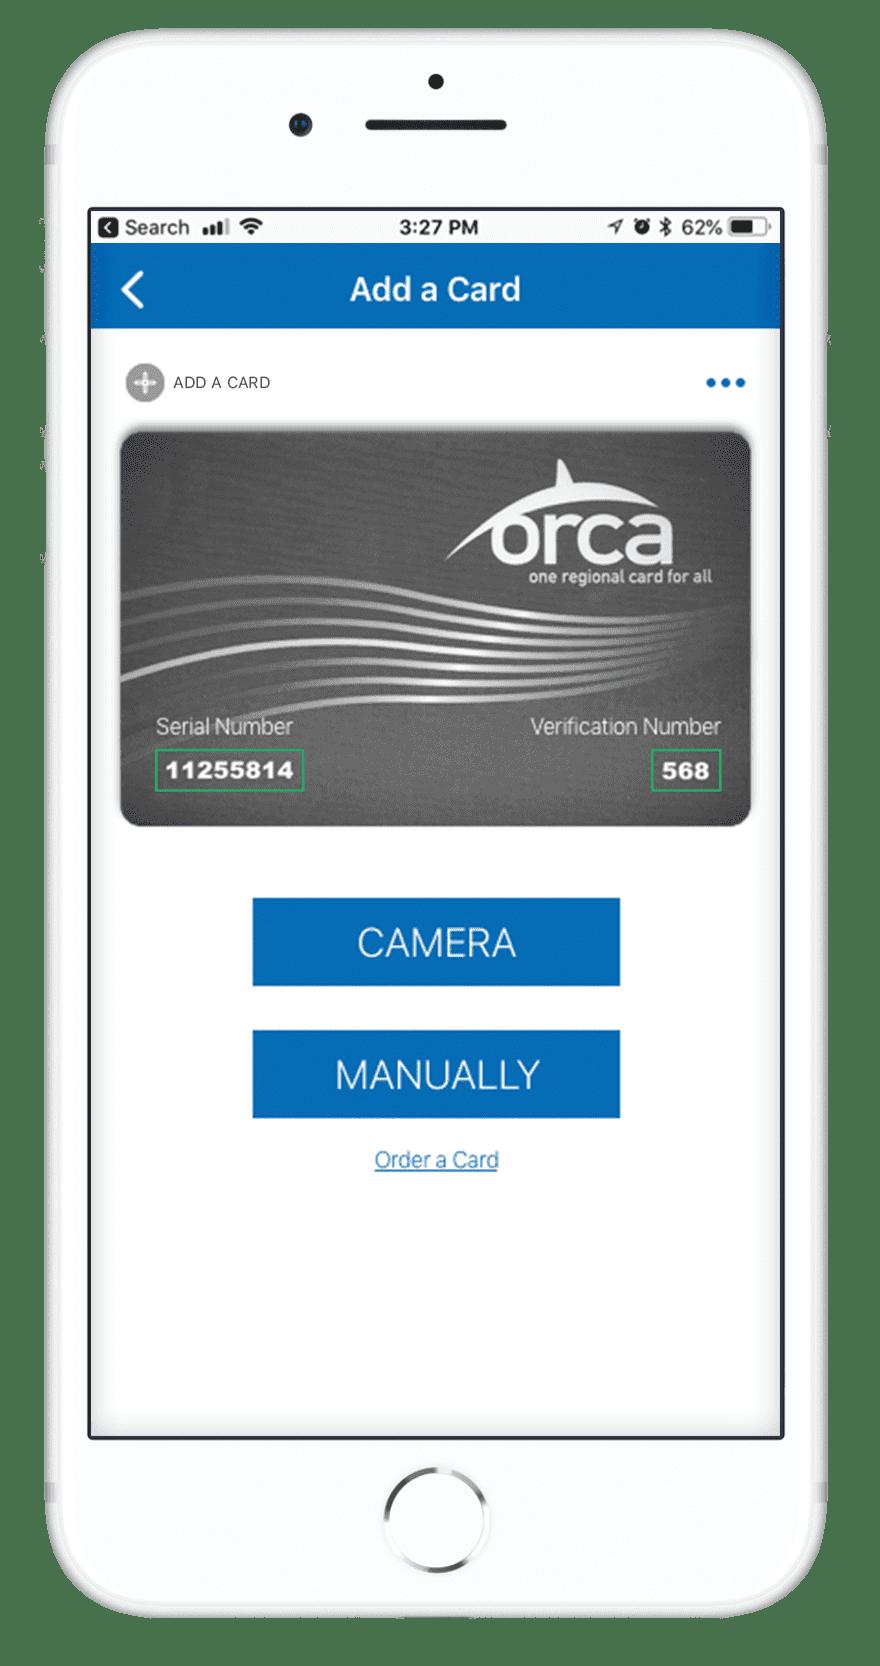 Orca Card 2 - Add a Card Screen